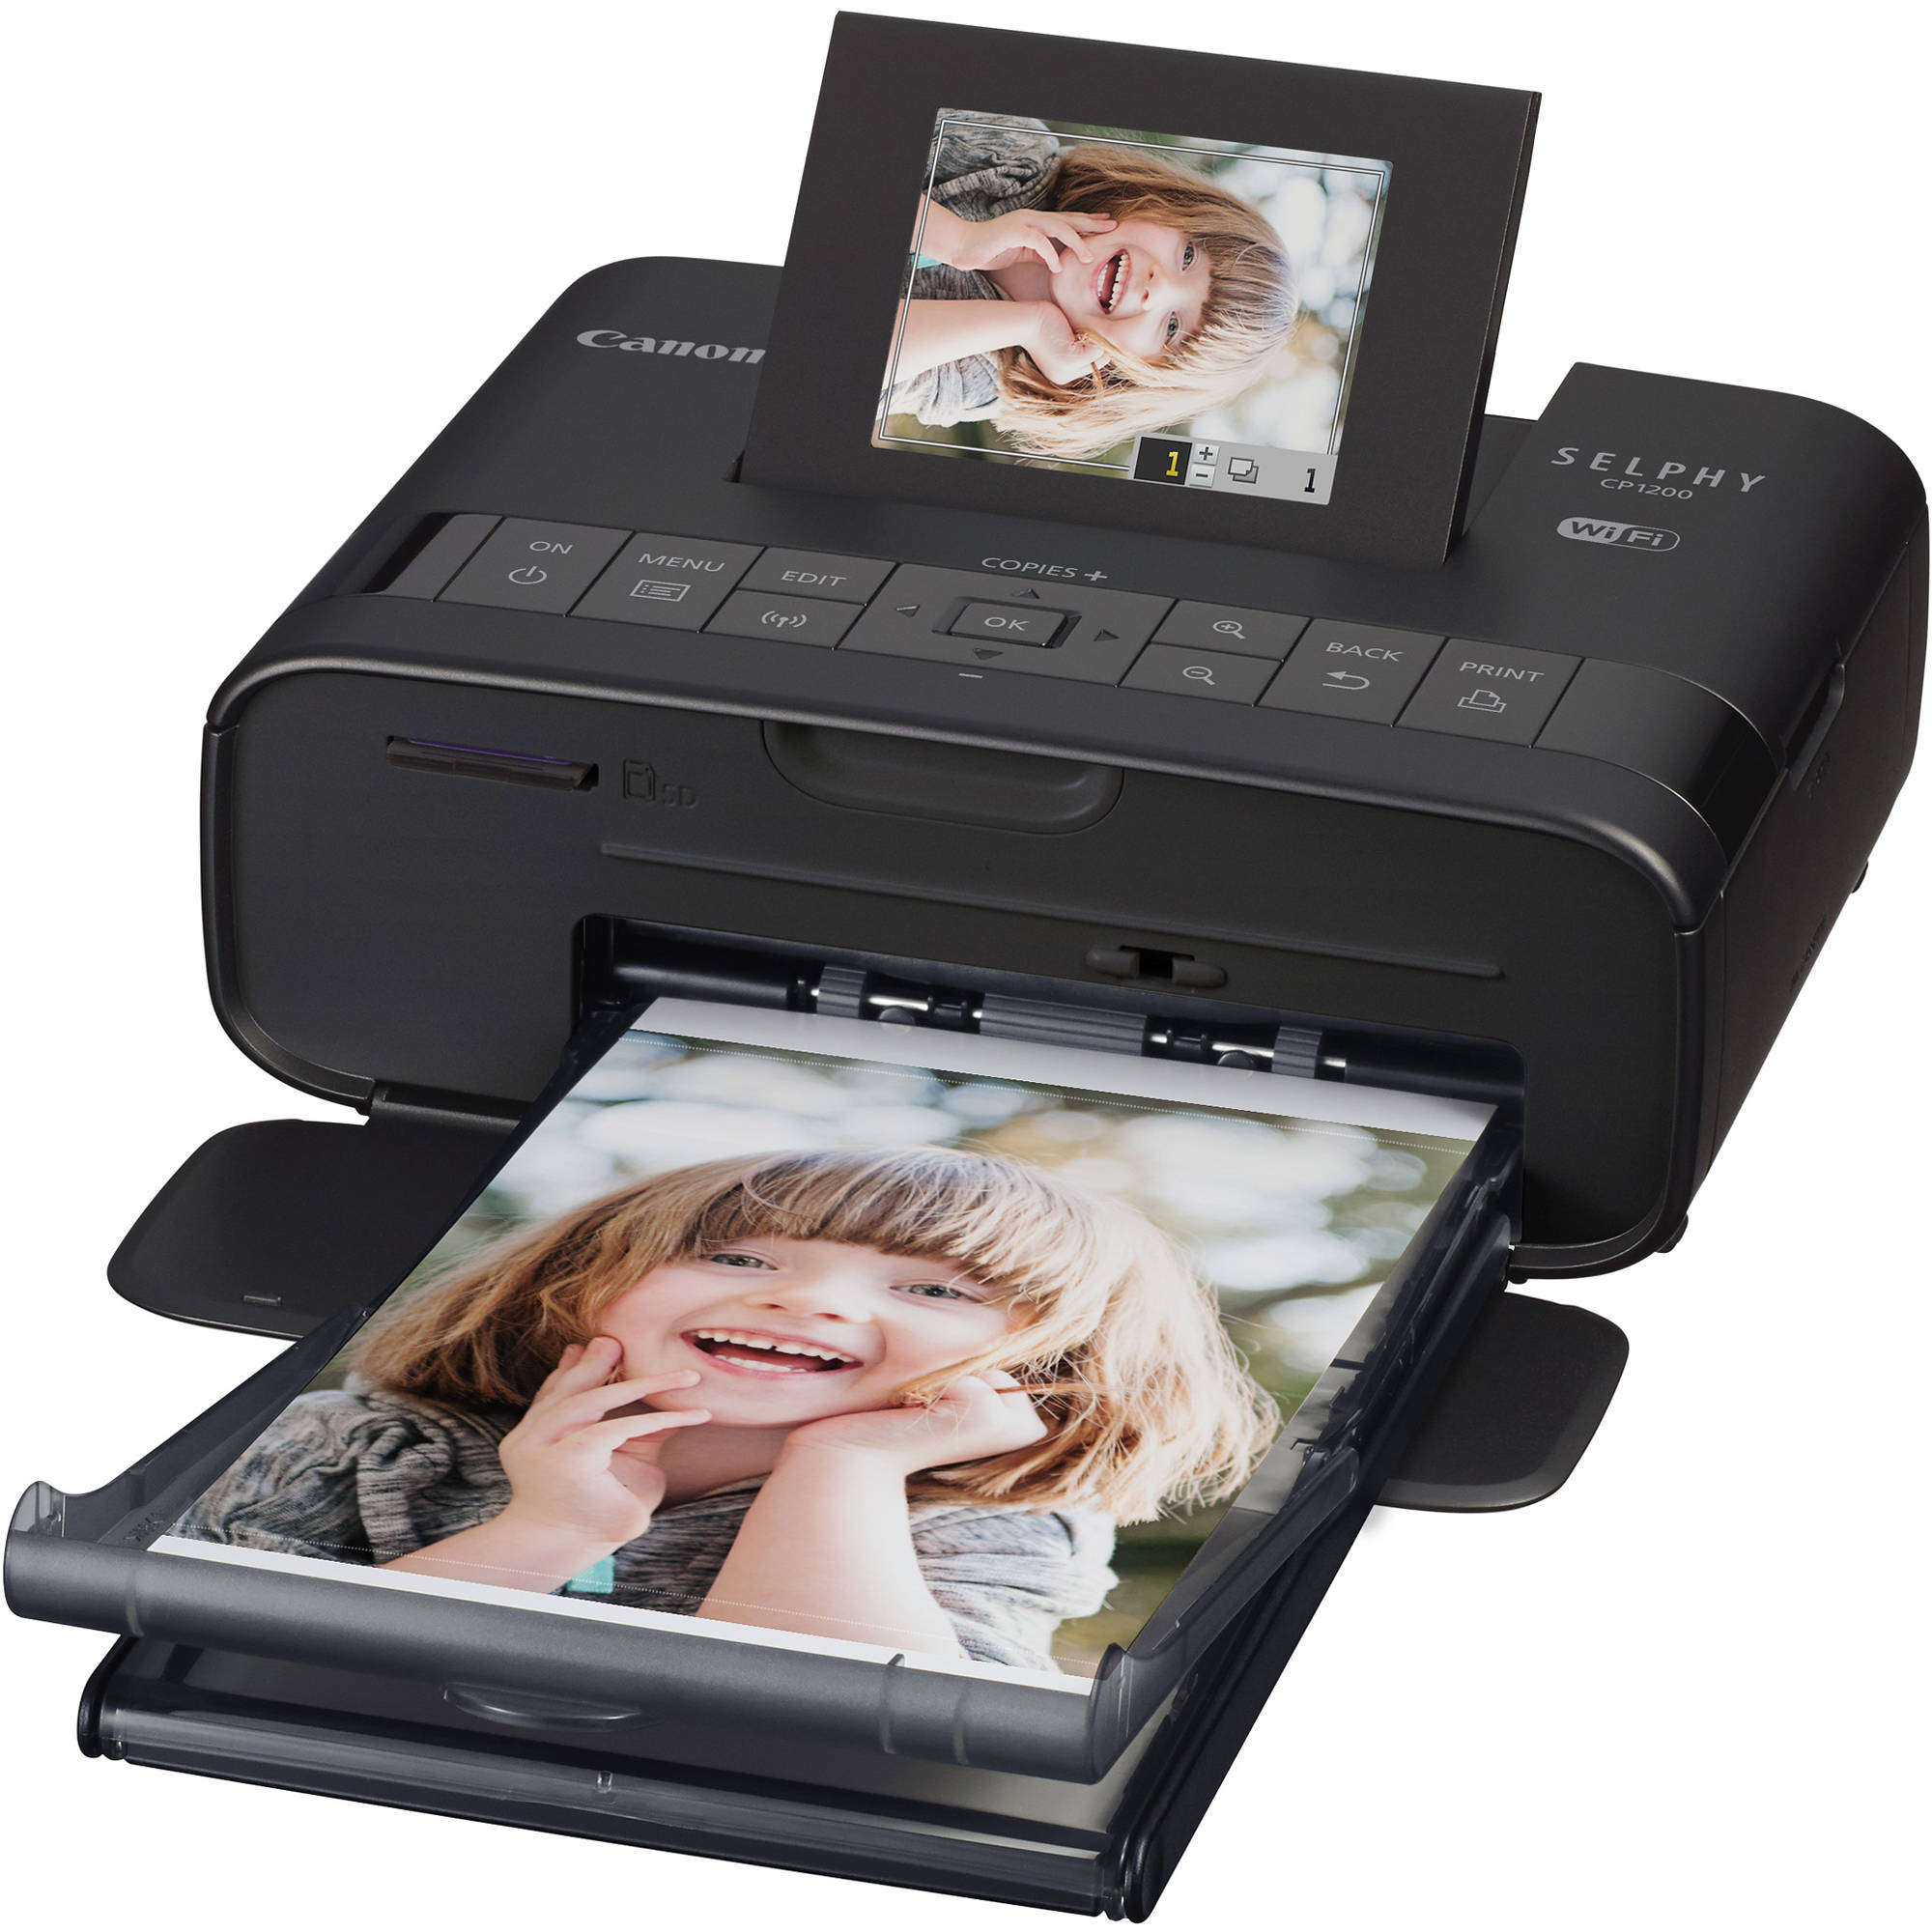 Compact Photo Printer & Media